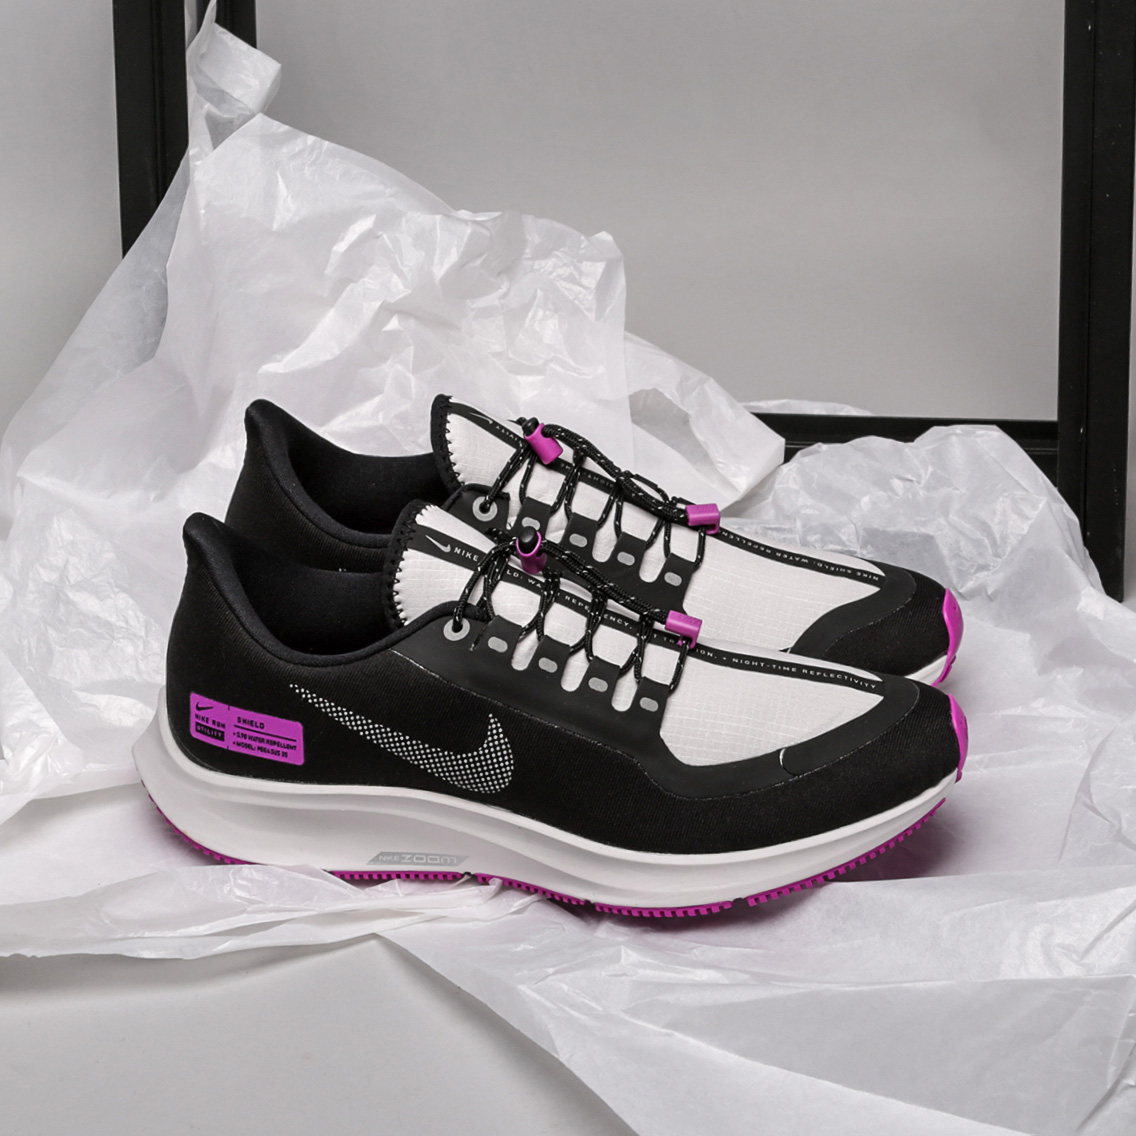 sports shoes 8d785 1b0d3 Кроссовки Nike Air Zoom Pegasus 35 Shield NRG